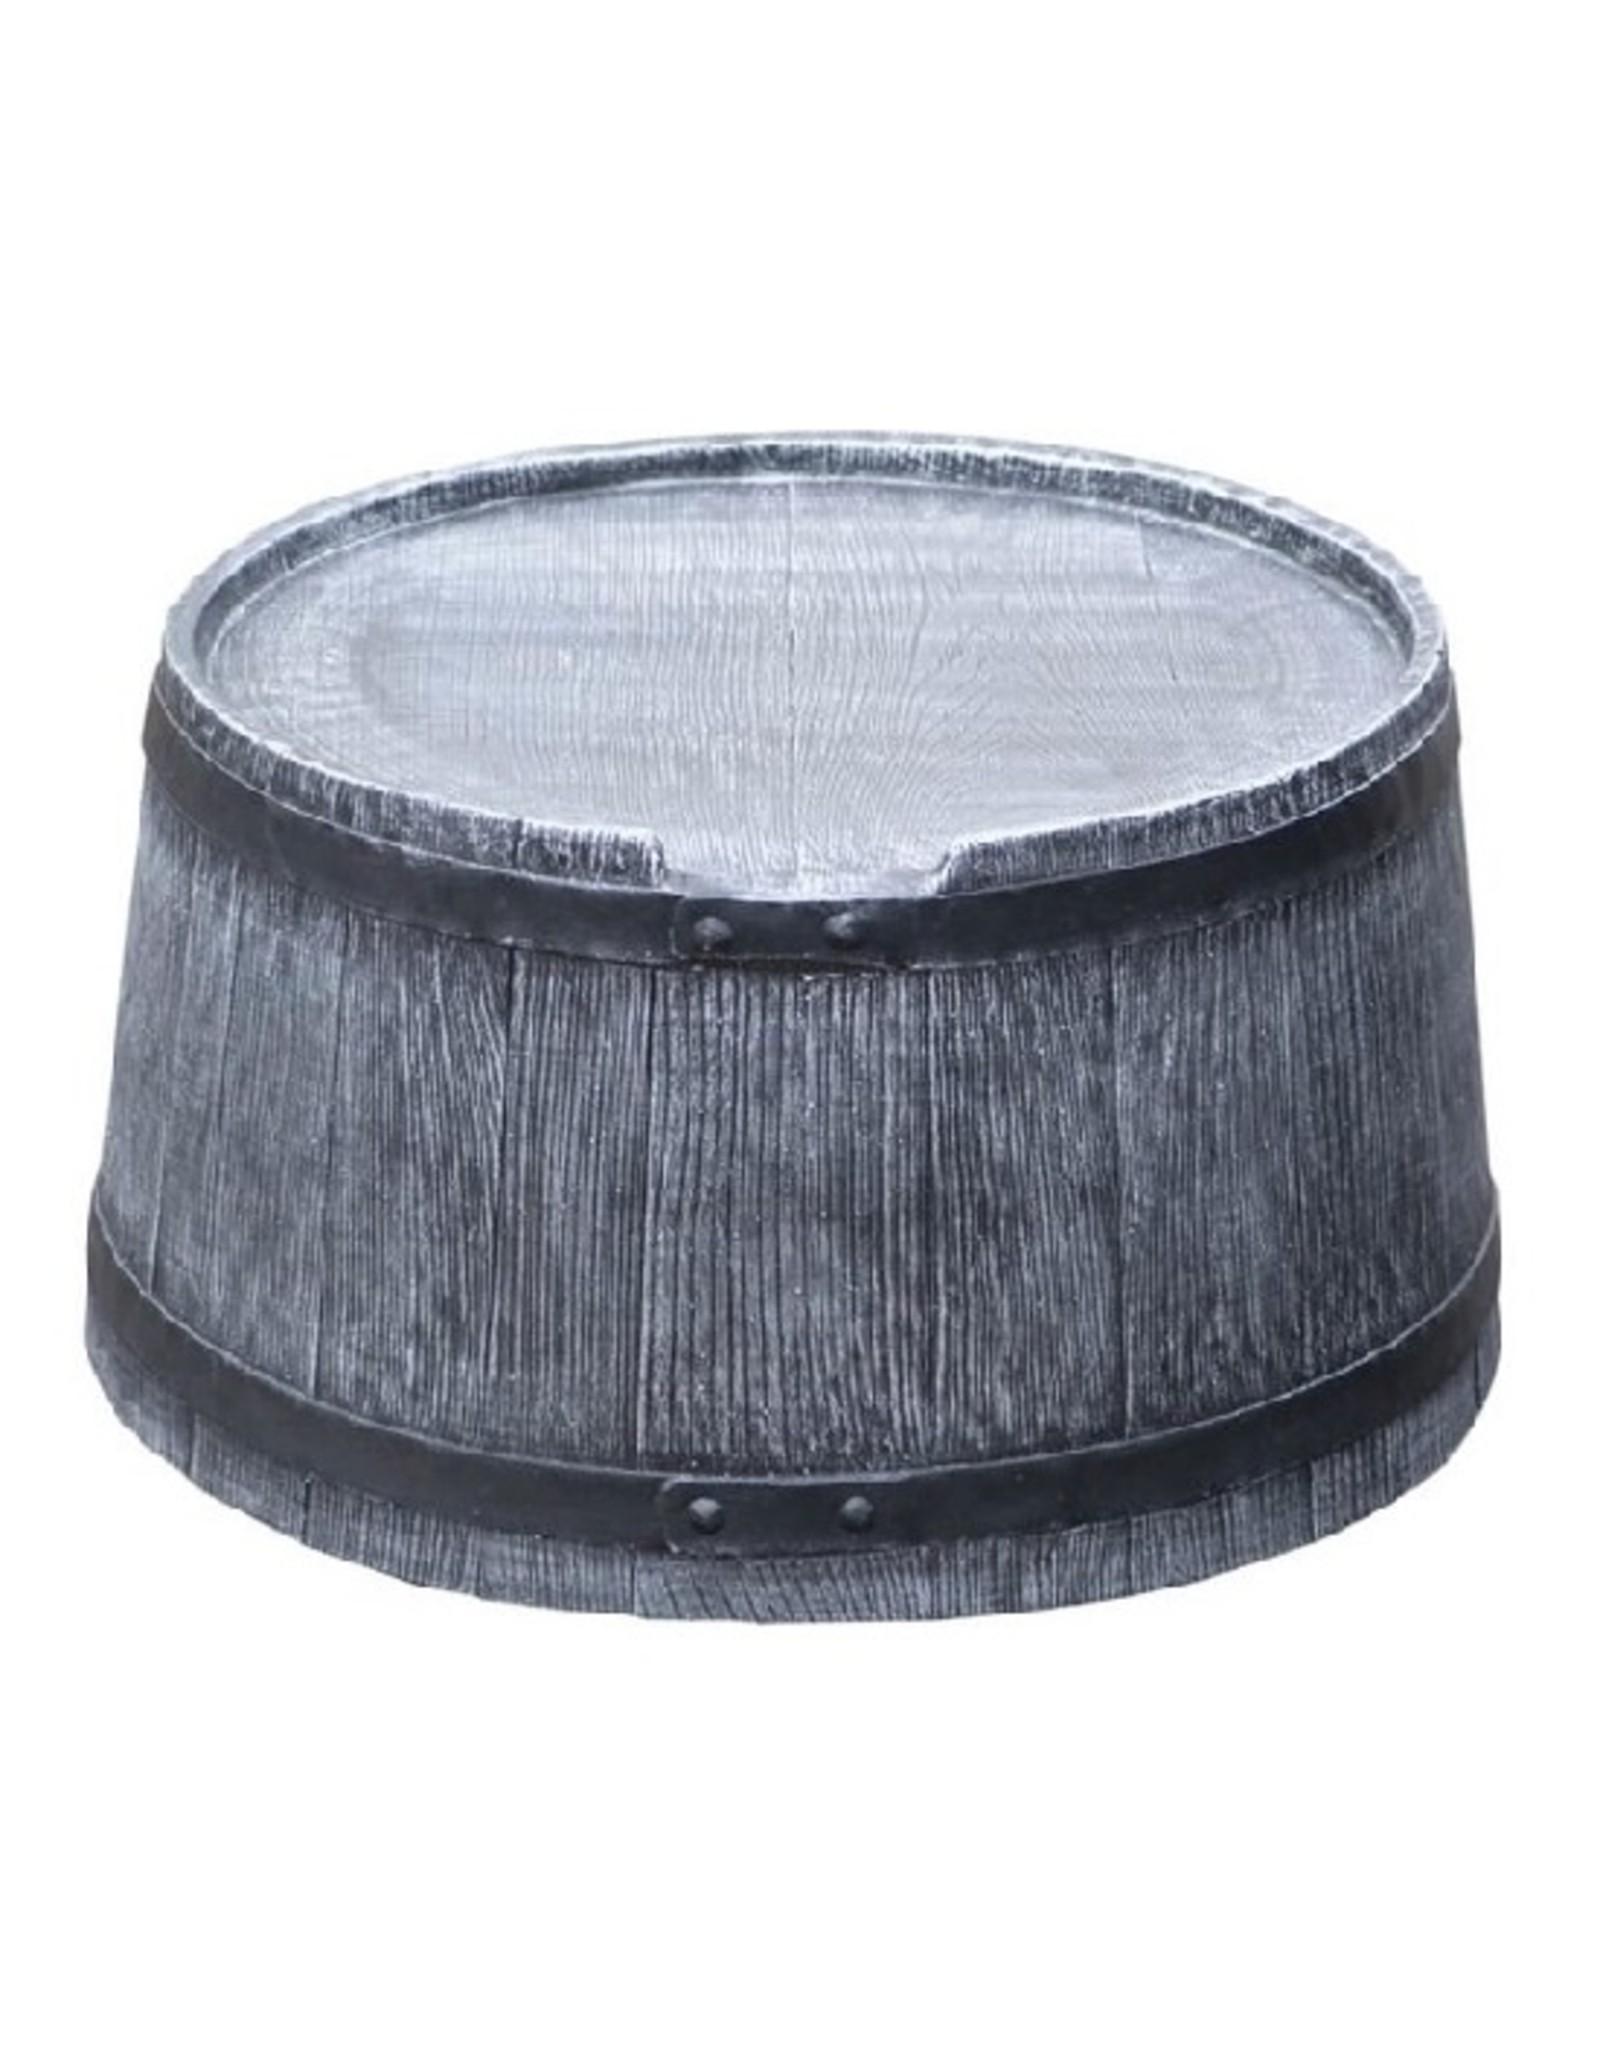 Roto standaard 120 liter grijs